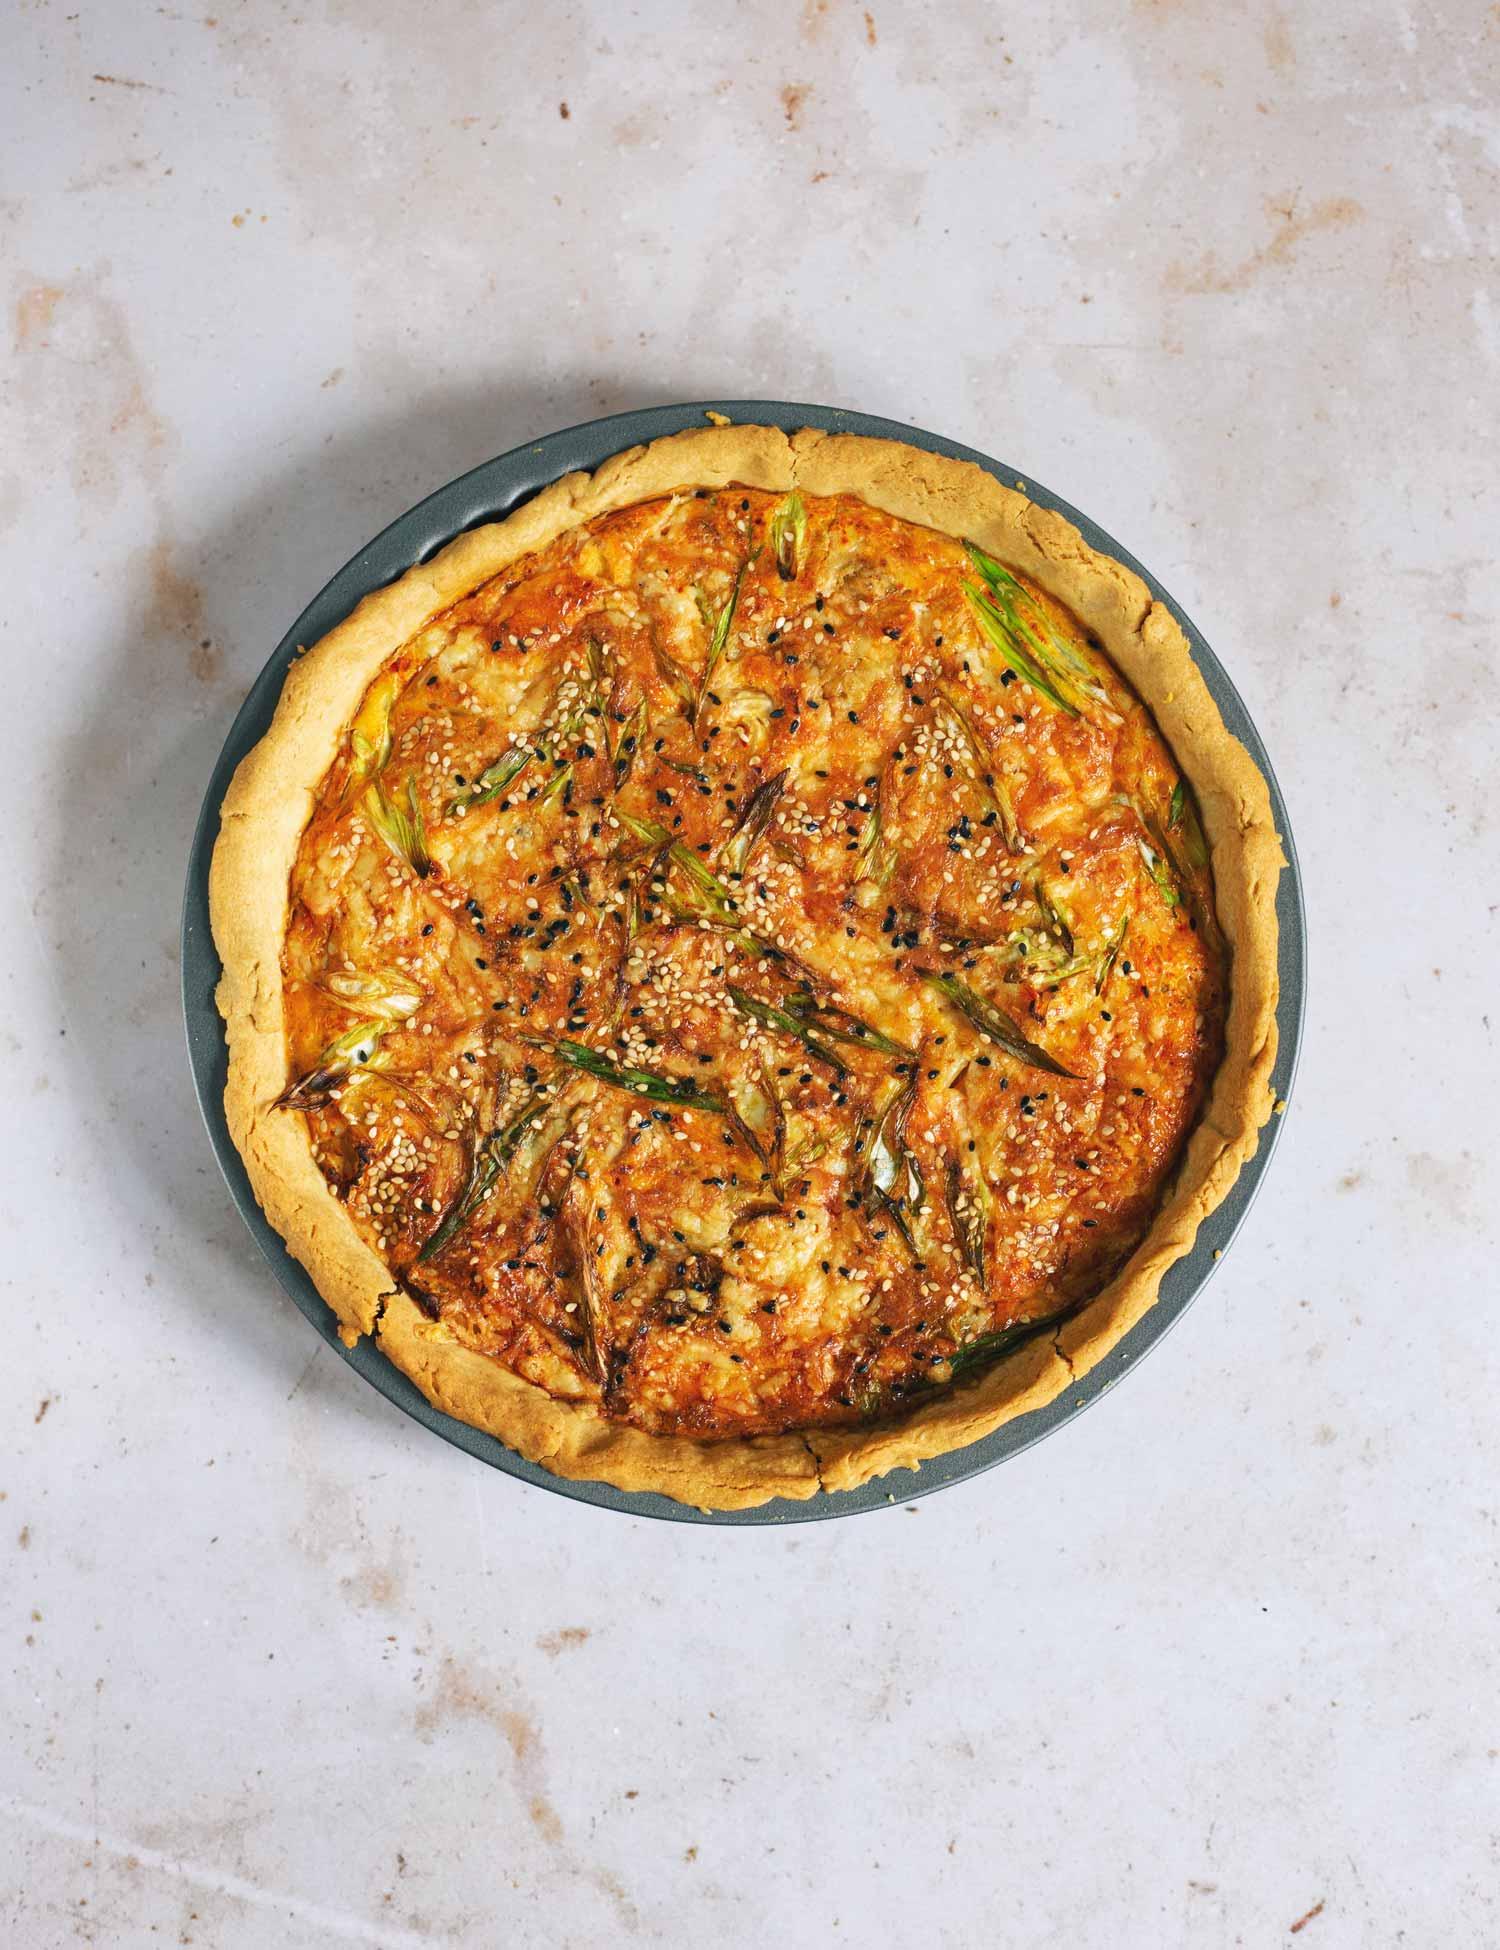 A quiche still in the baking tin